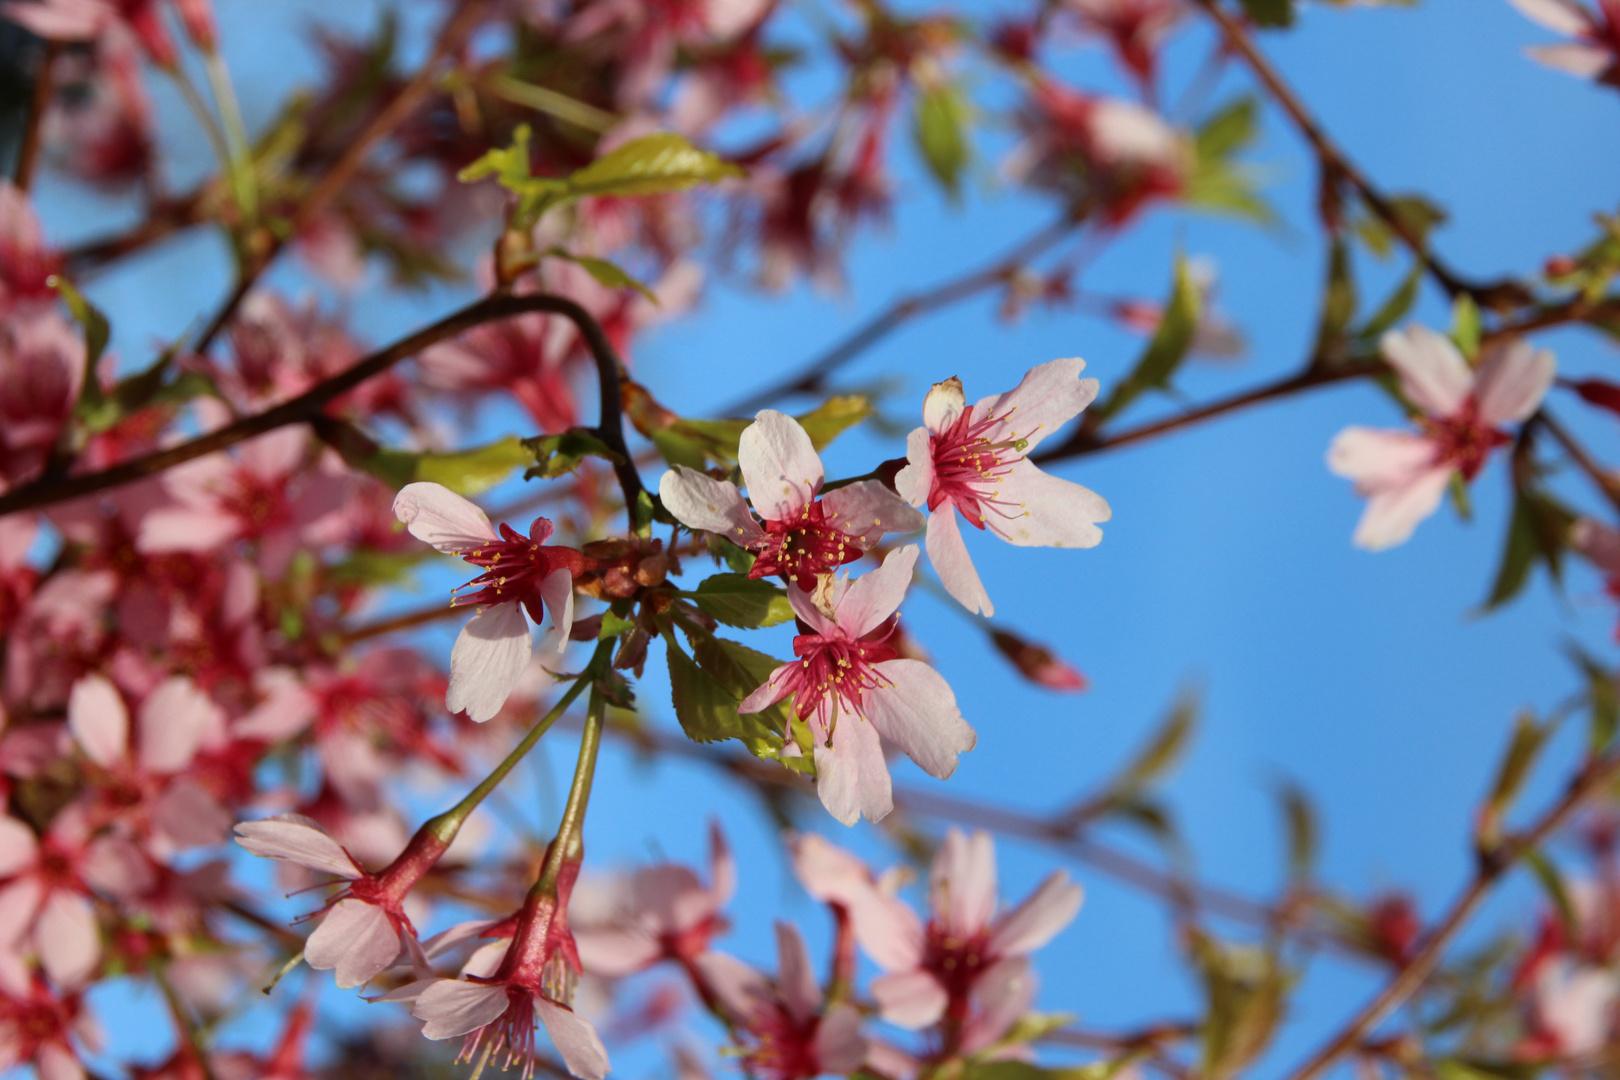 Frühling im Garten!